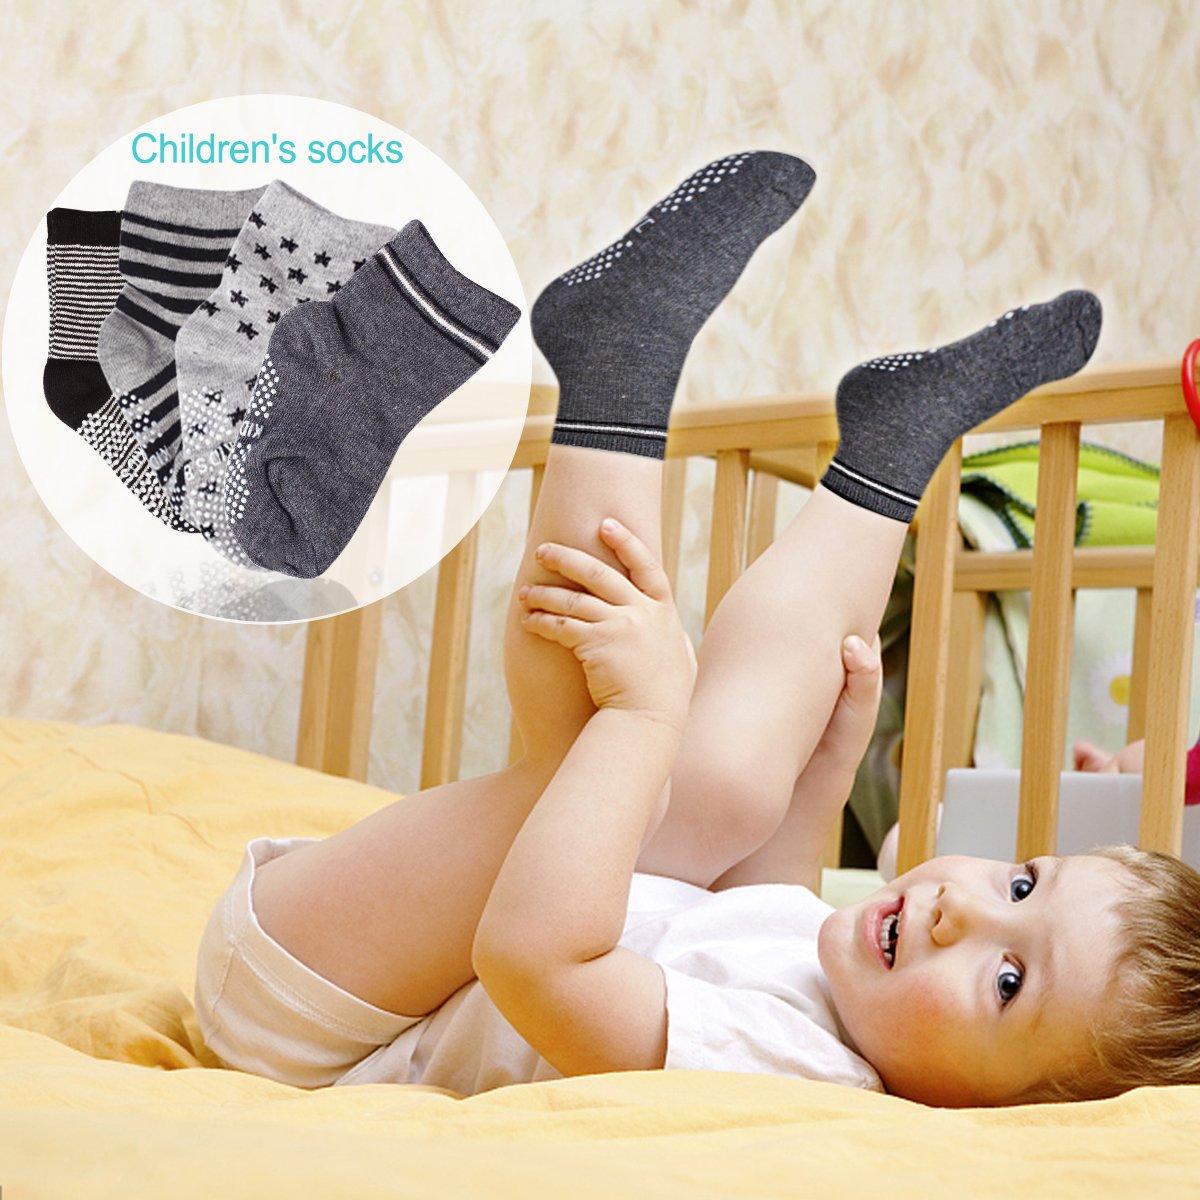 SuPoo 6 Pairs Baby Socks Non Skid Baby Cotton Socks Soft Anti-Slip Socks Baby Toddlers